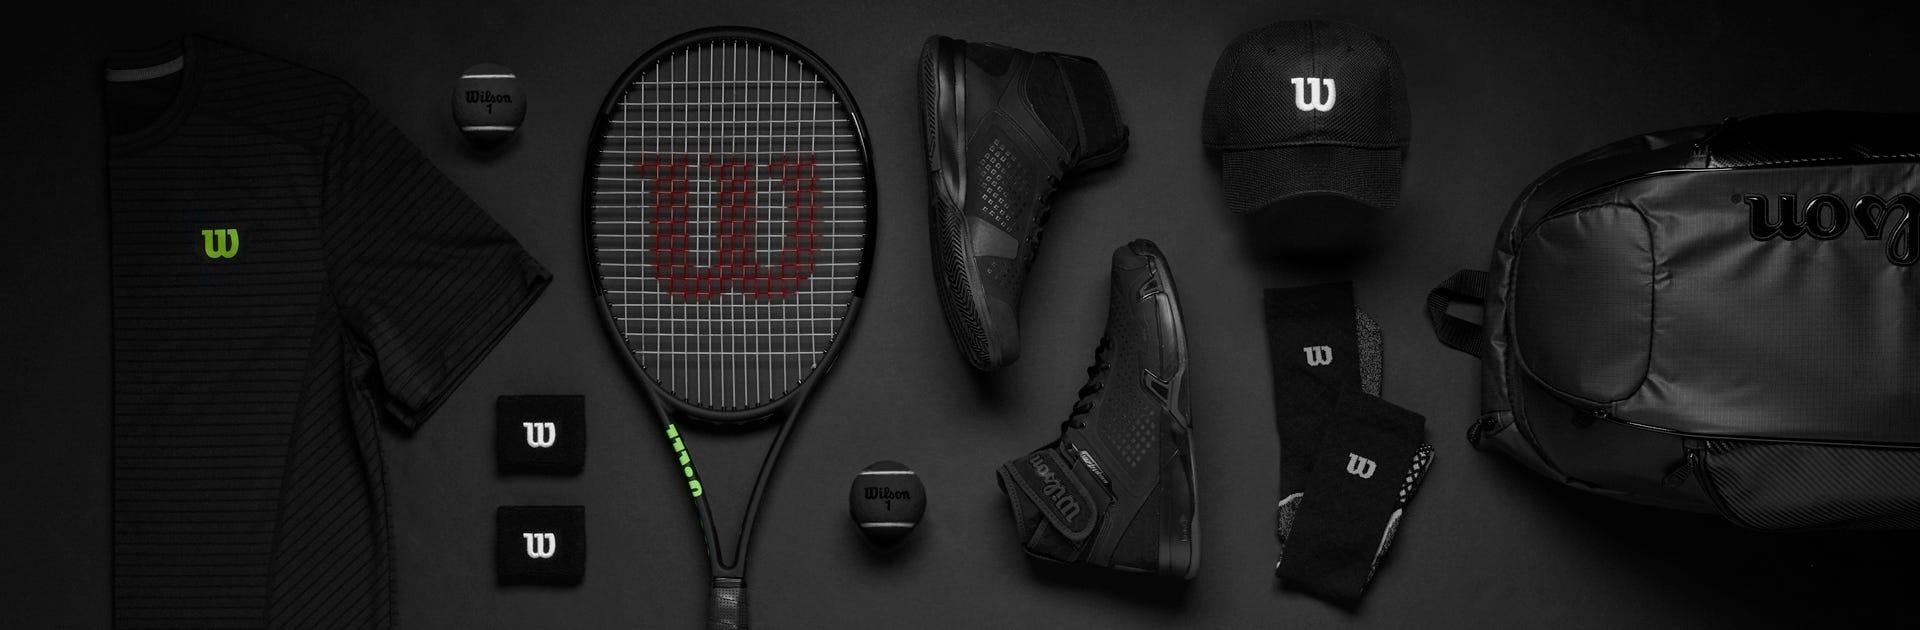 Black Edition | Wilson Sporting Goods